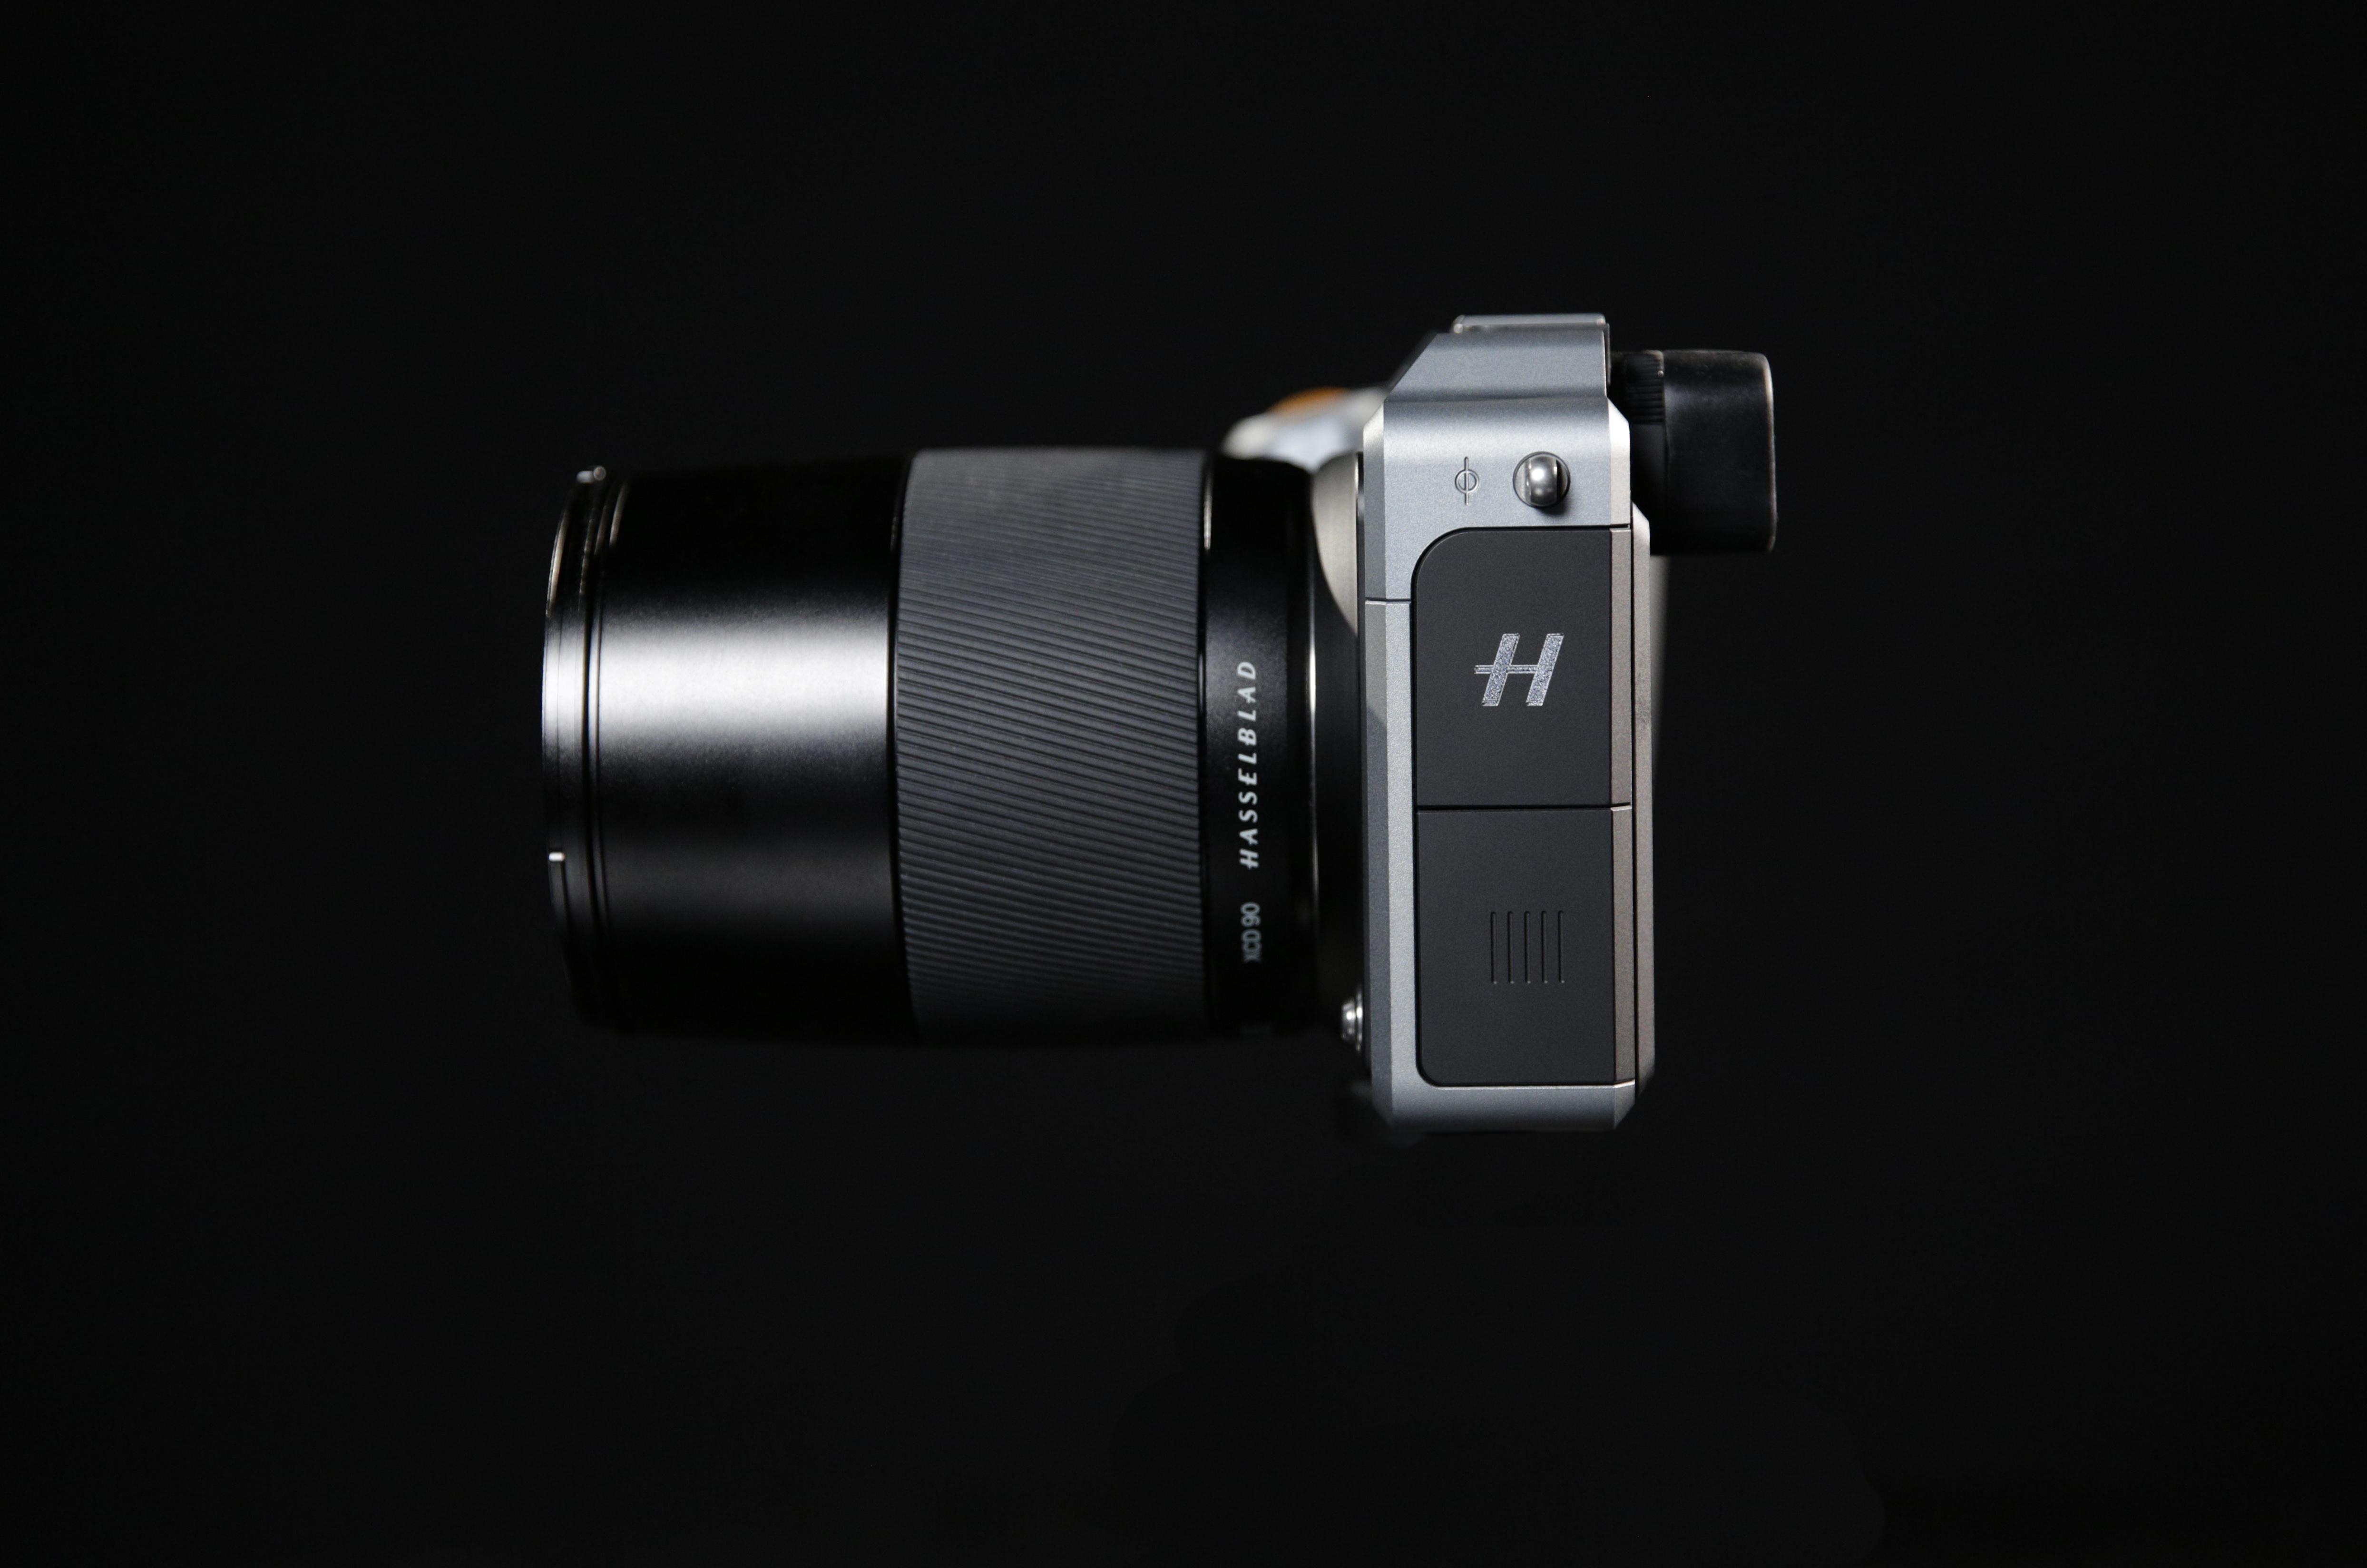 Medium Format Mirrorless Has Arrived: The Hasselblad X1D-50c